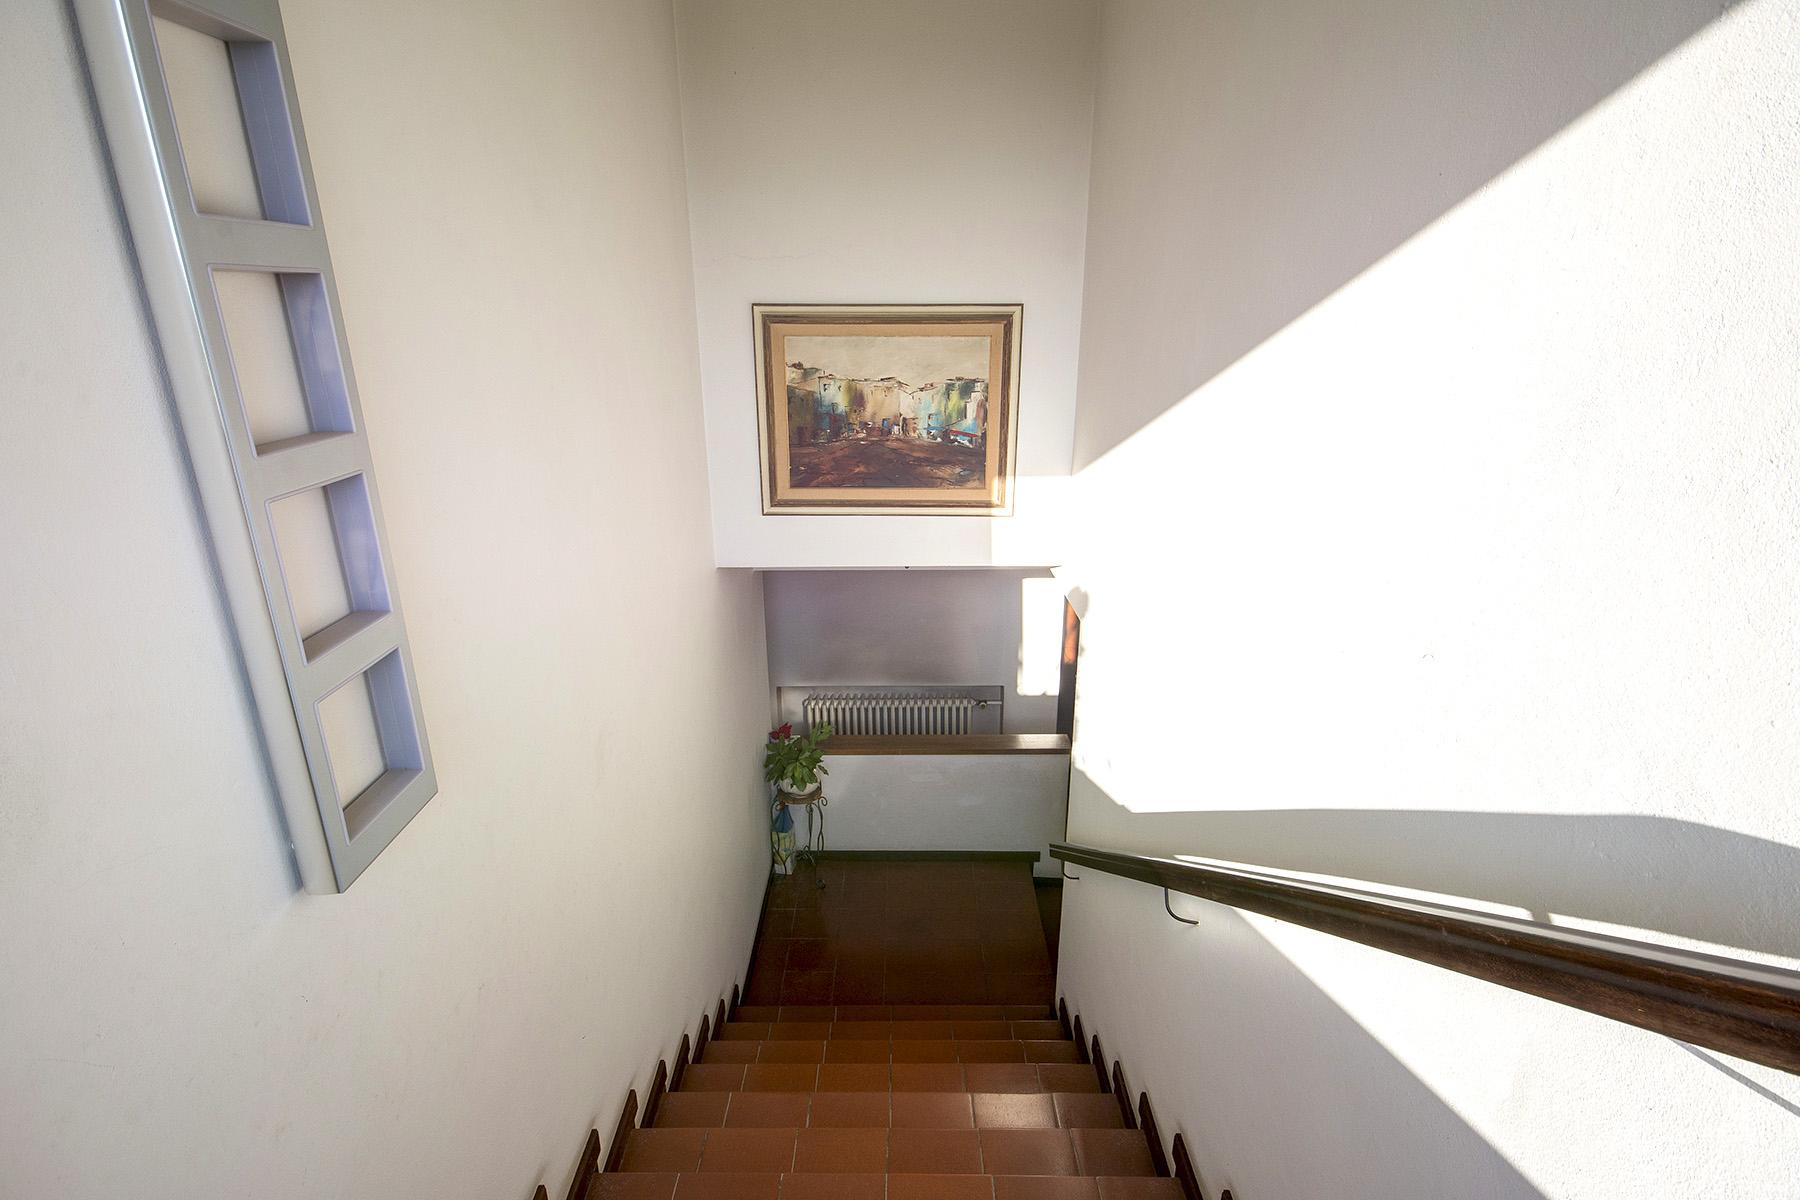 Villa in Vendita a Capannori: 5 locali, 500 mq - Foto 18